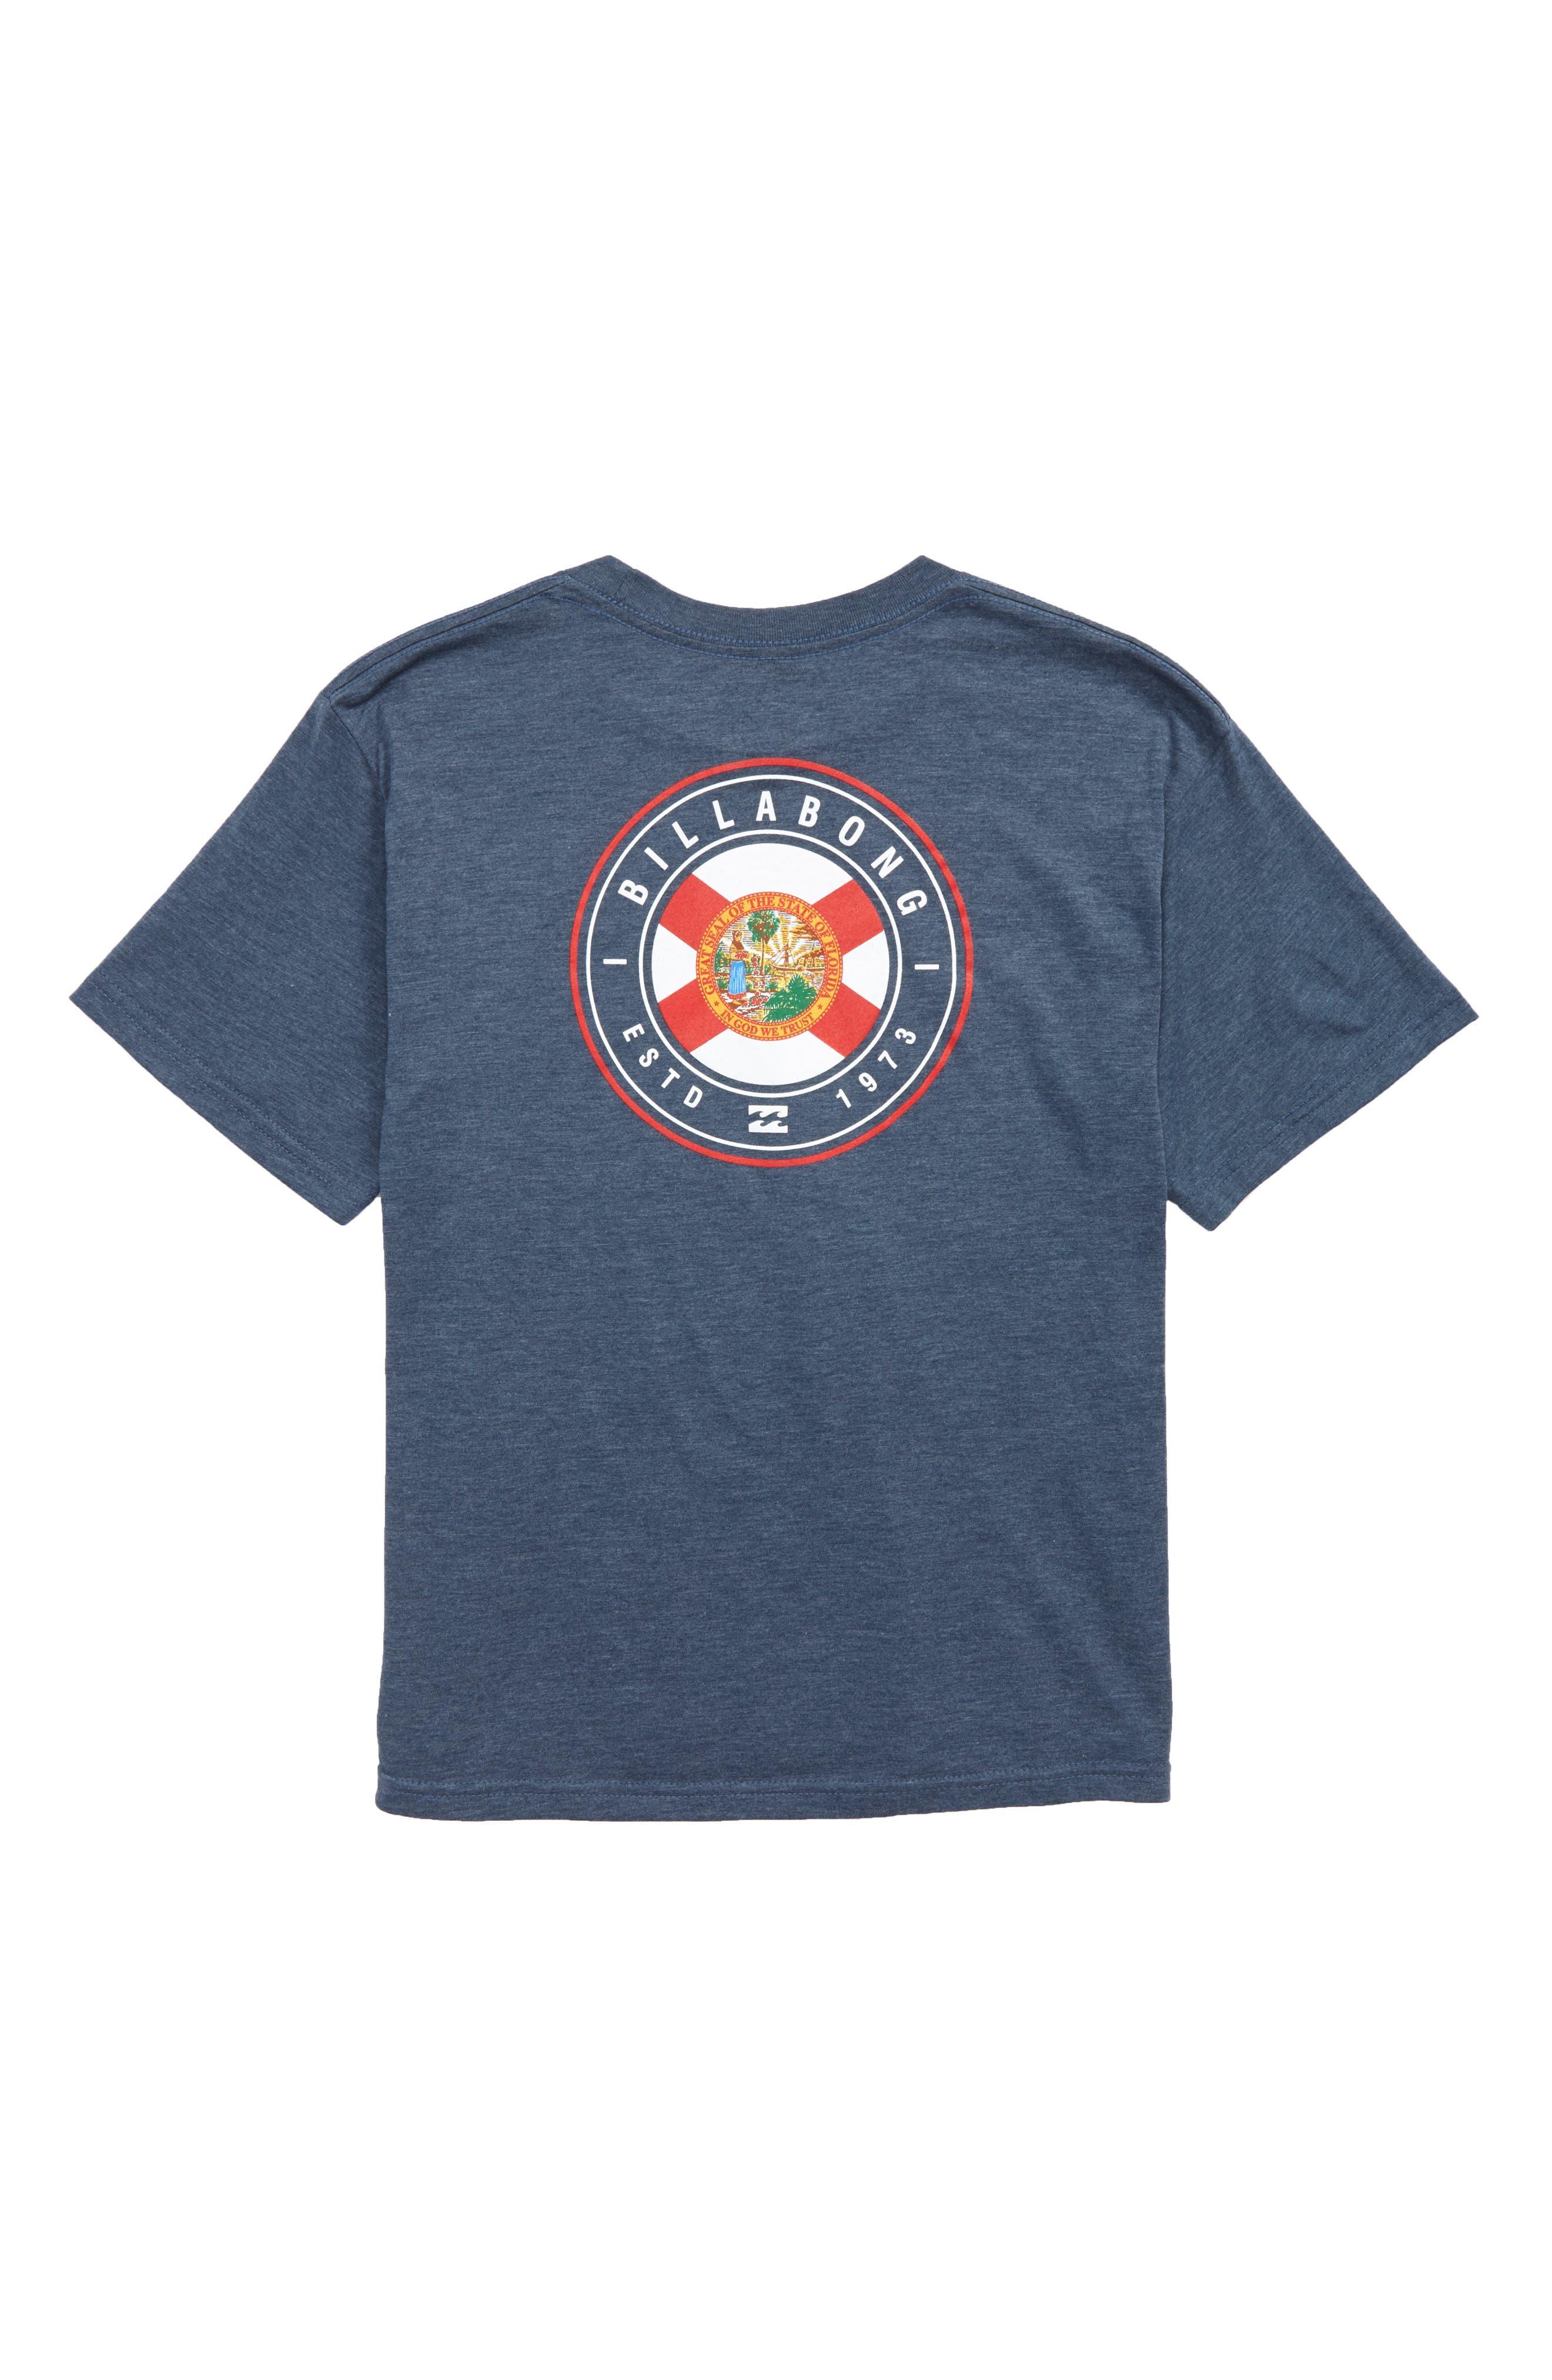 Native Rotor FL T-Shirt,                             Alternate thumbnail 2, color,                             Denim Heather